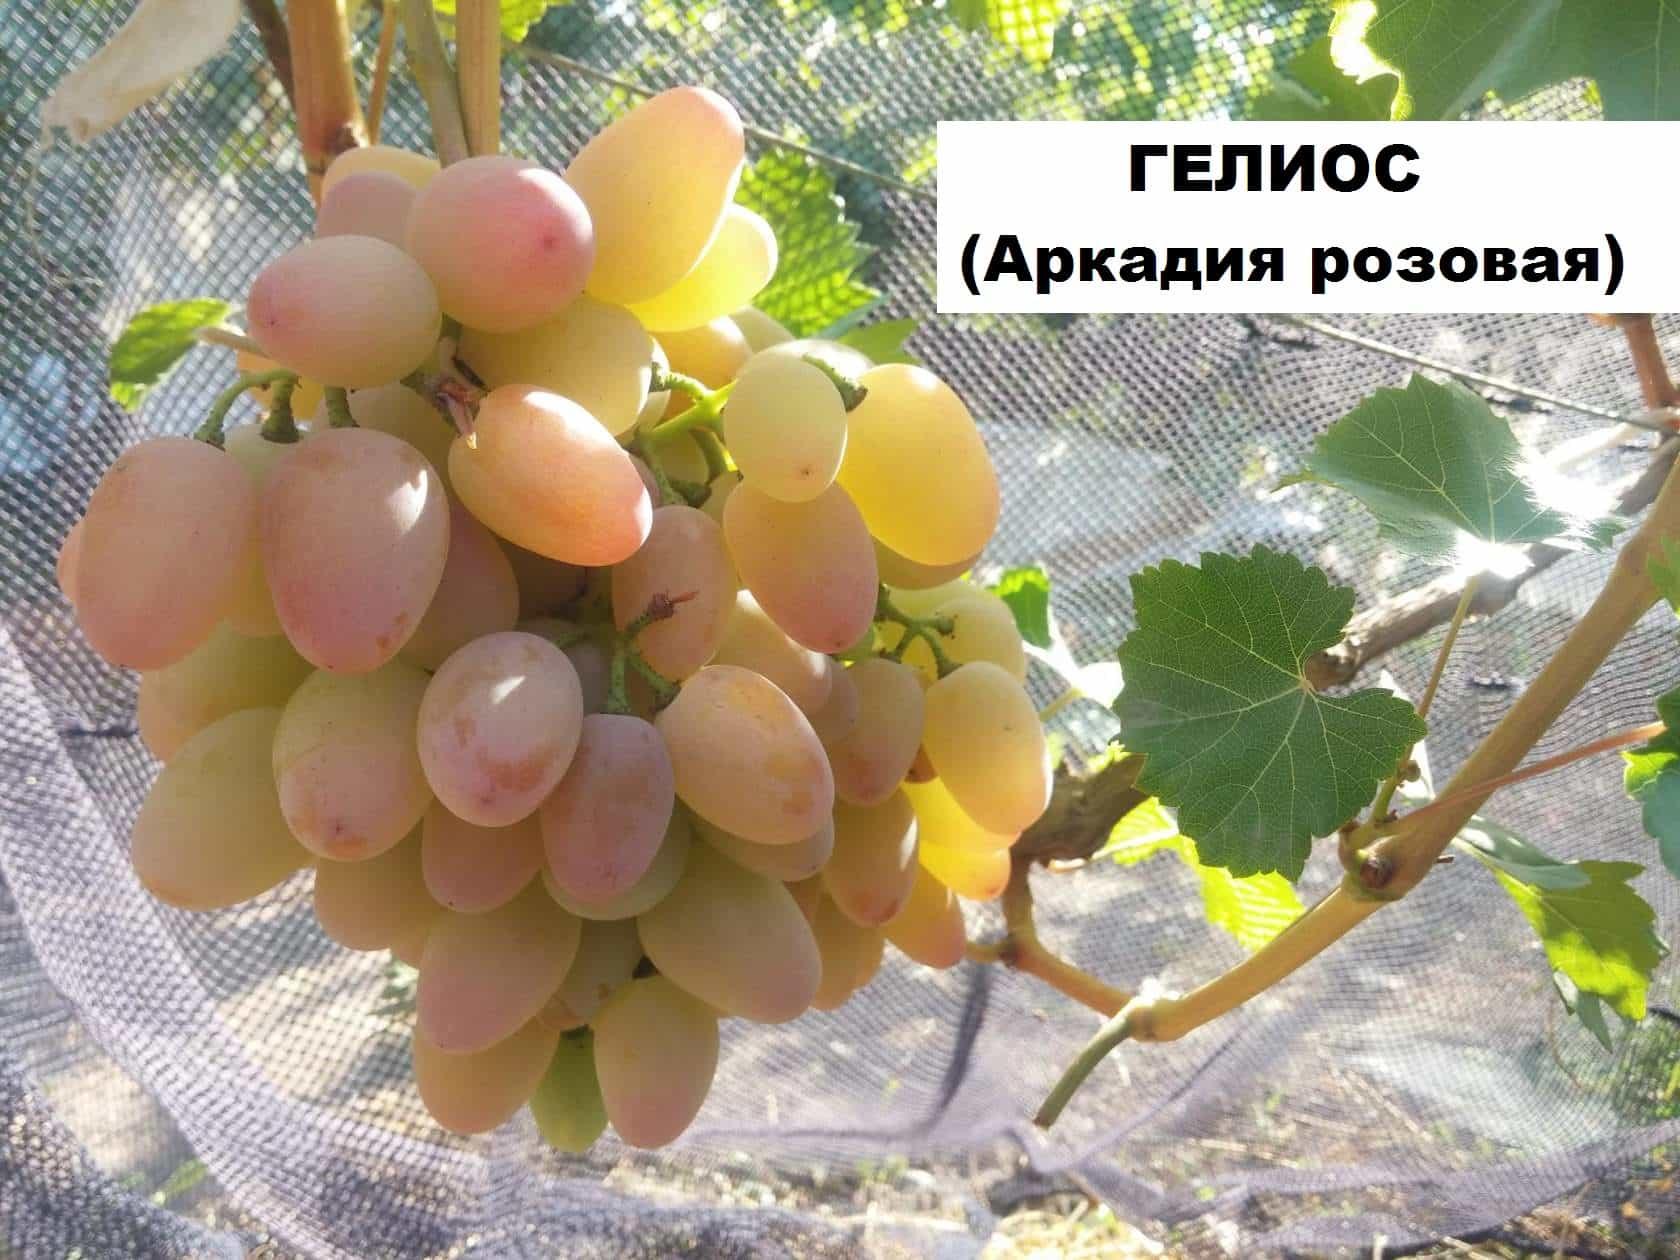 сорт винограда Гелиос